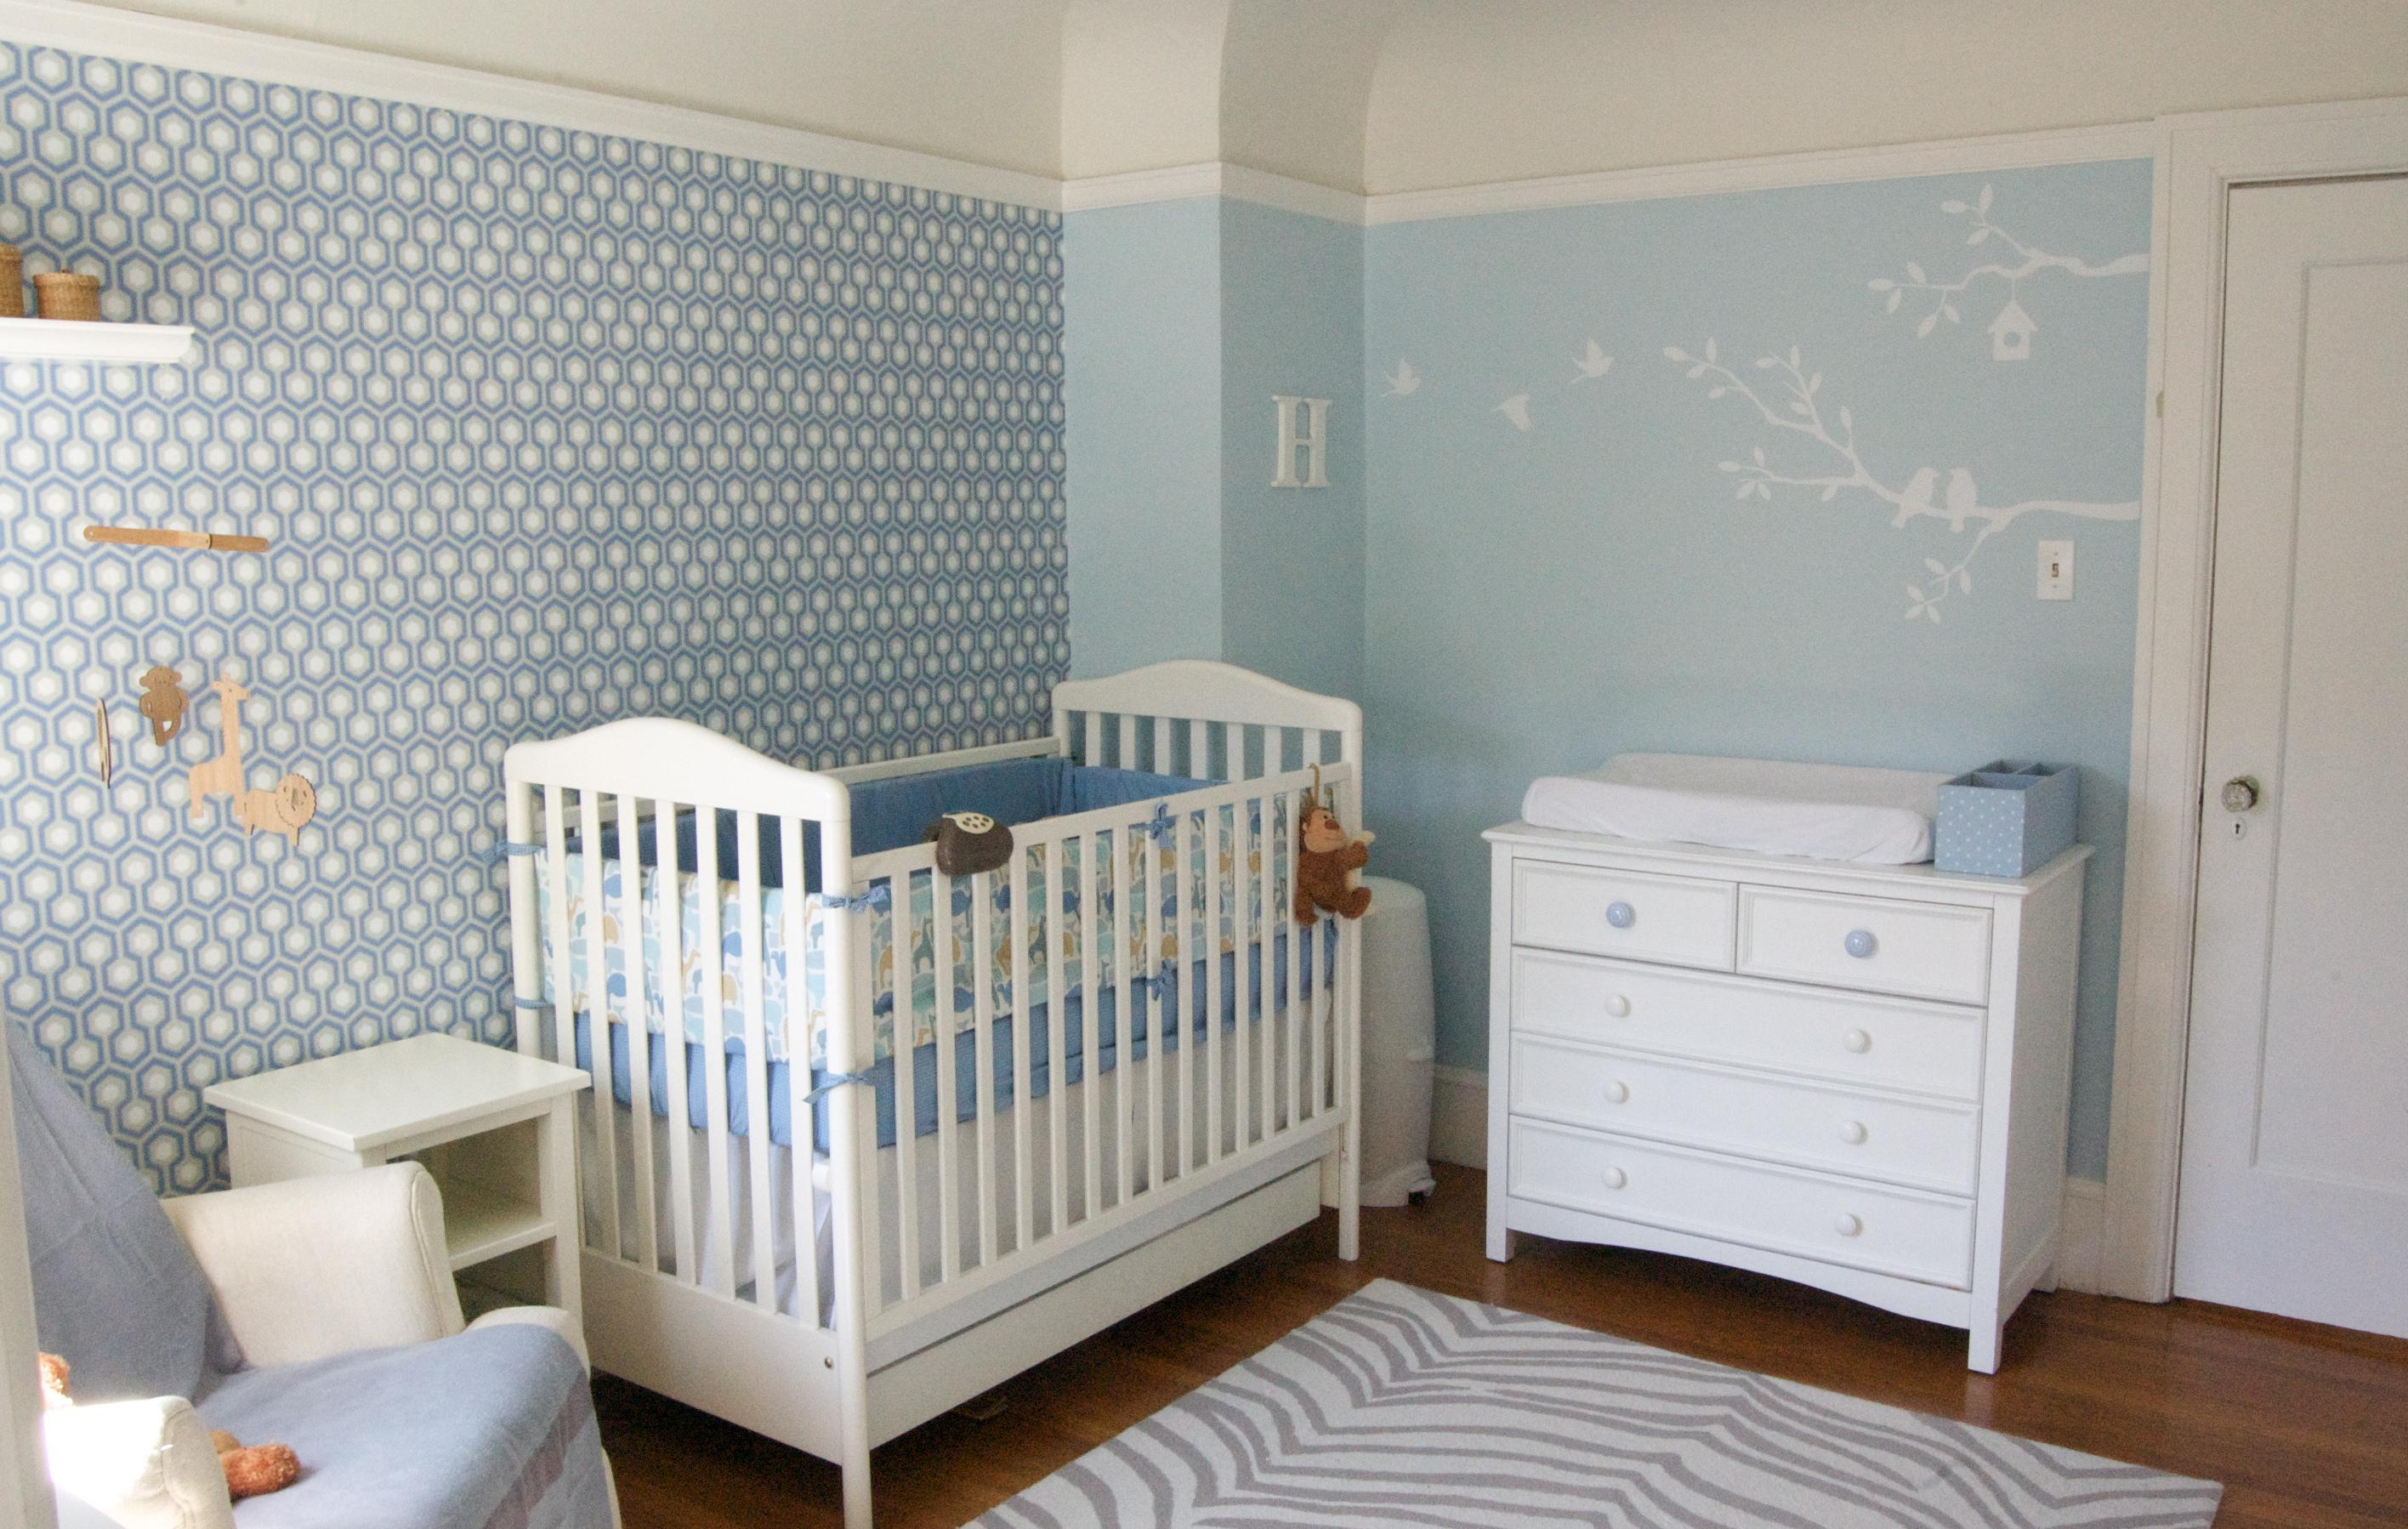 Custom Nursery Art by Kimberly: Top Baby Boy Nursery Designs of 2011